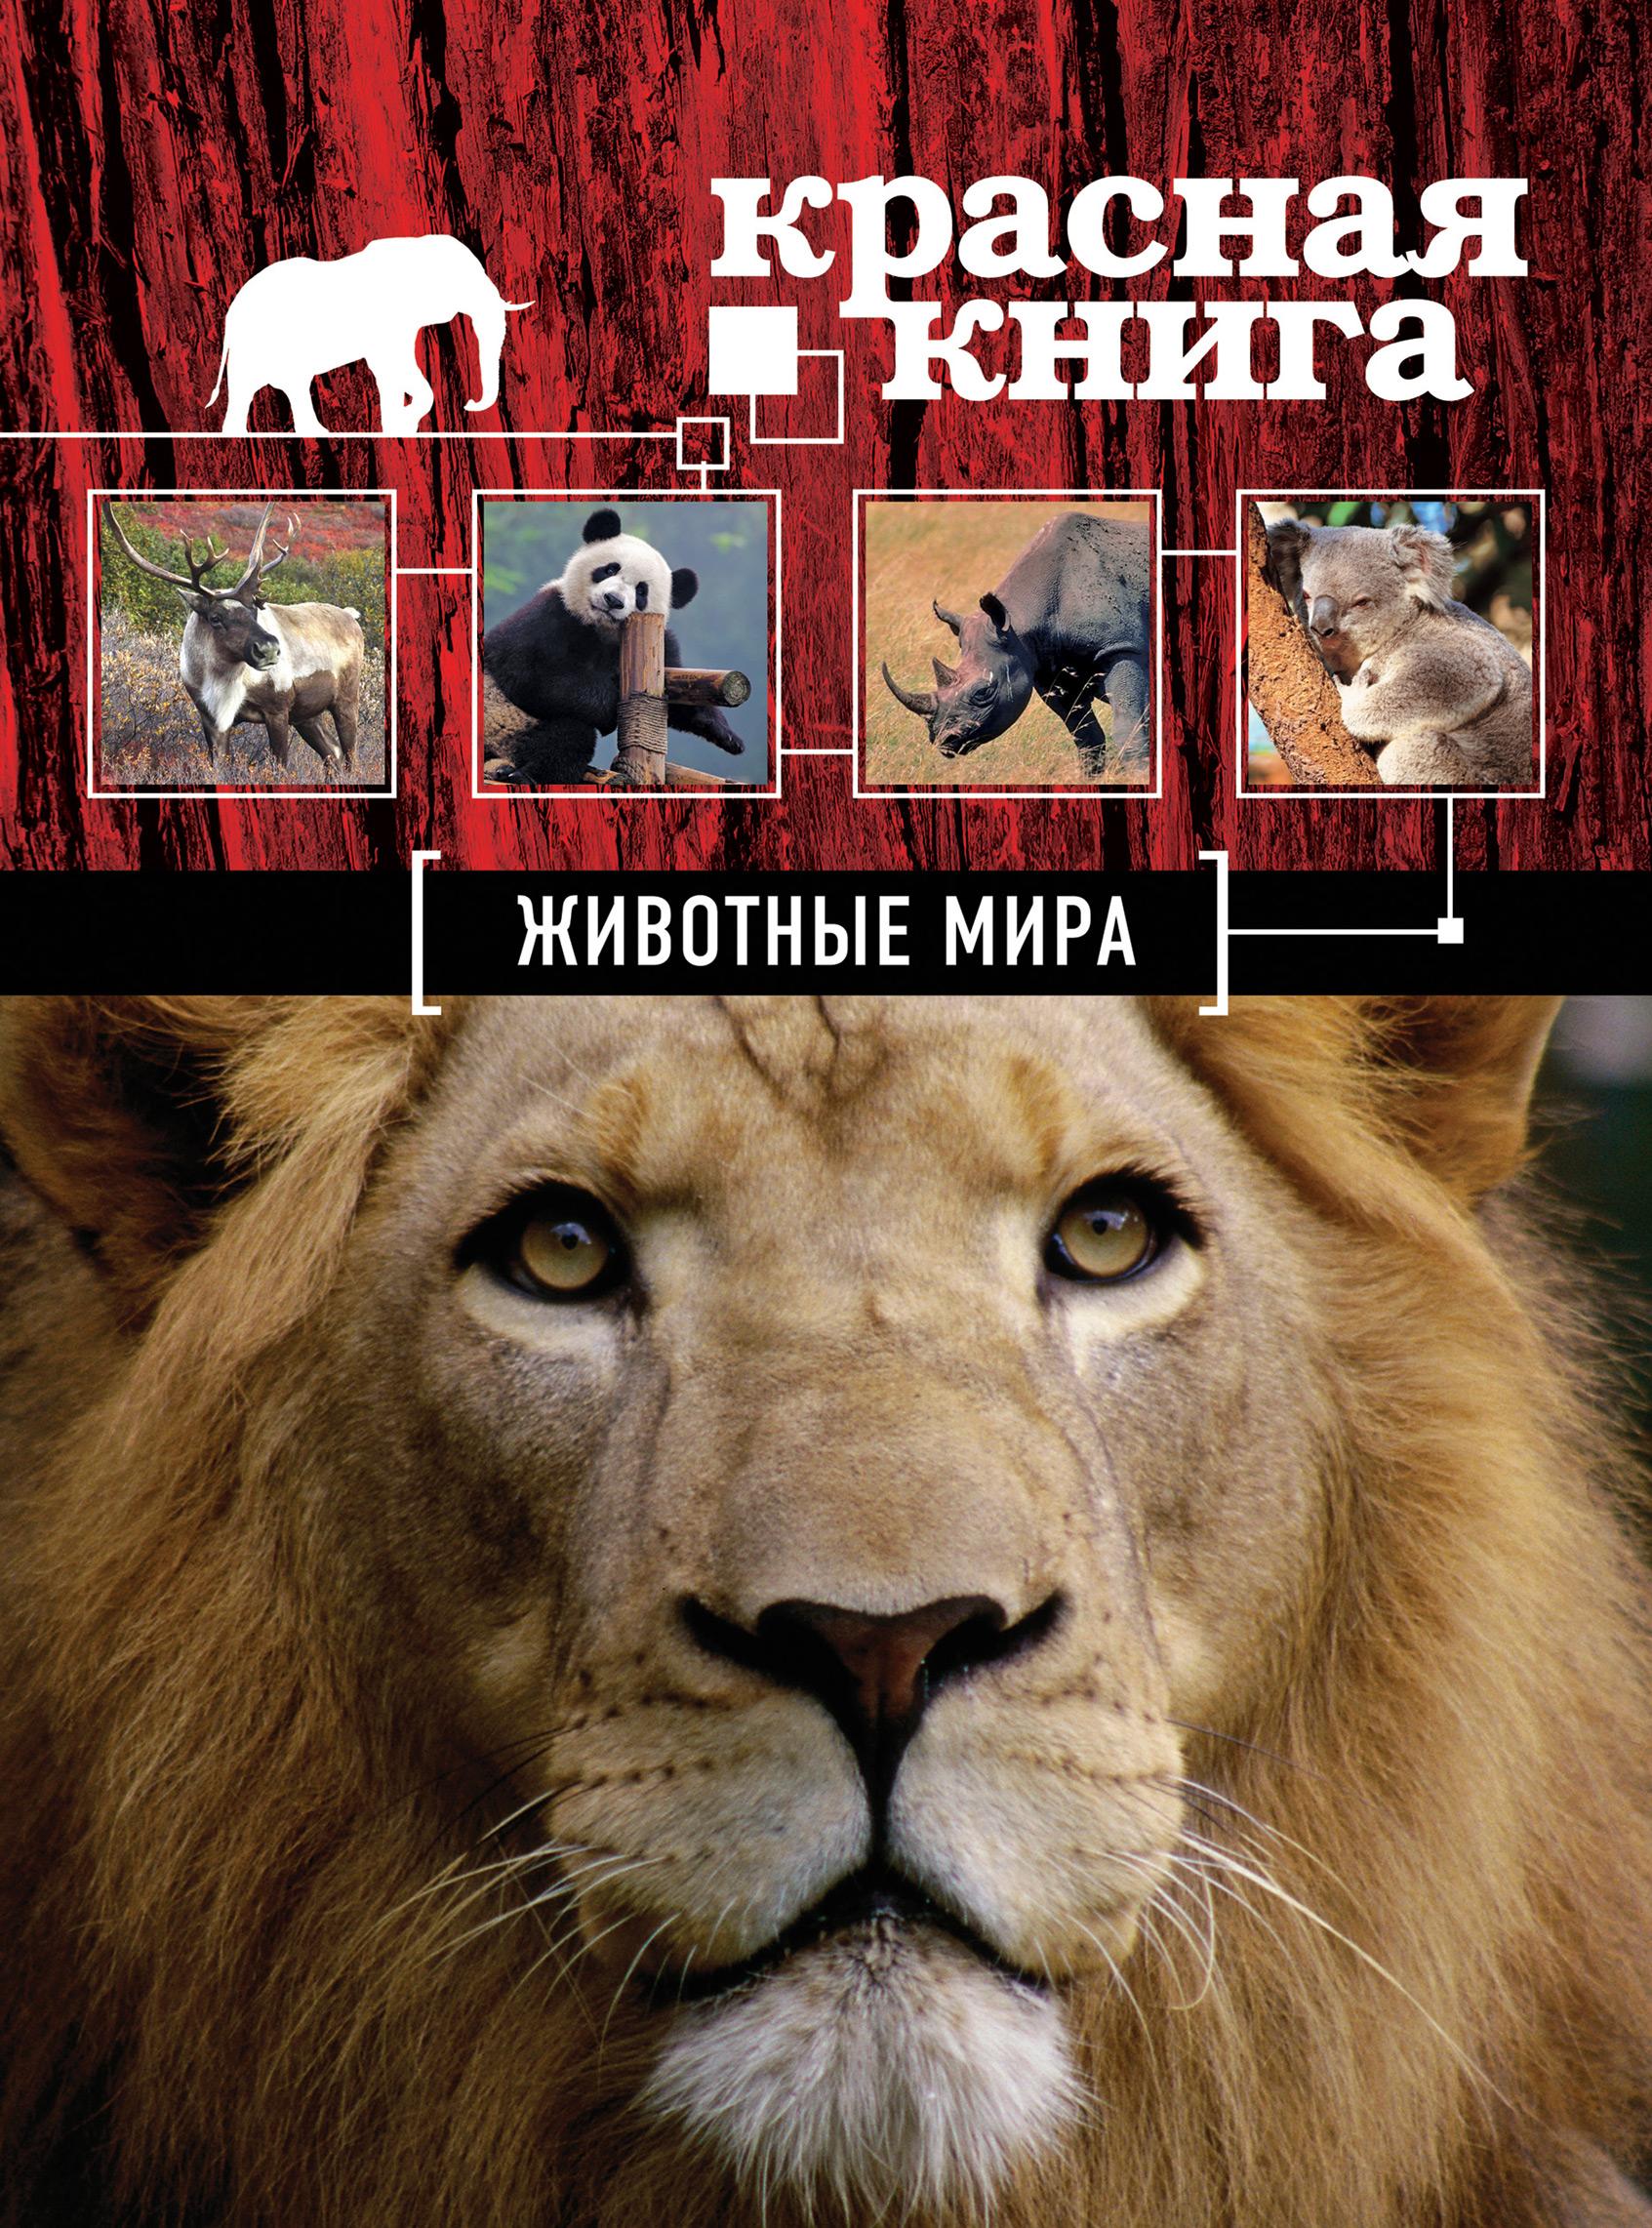 Оксана Скалдина Красная книга. Животные мира оксана скалдина красная книга животные мира